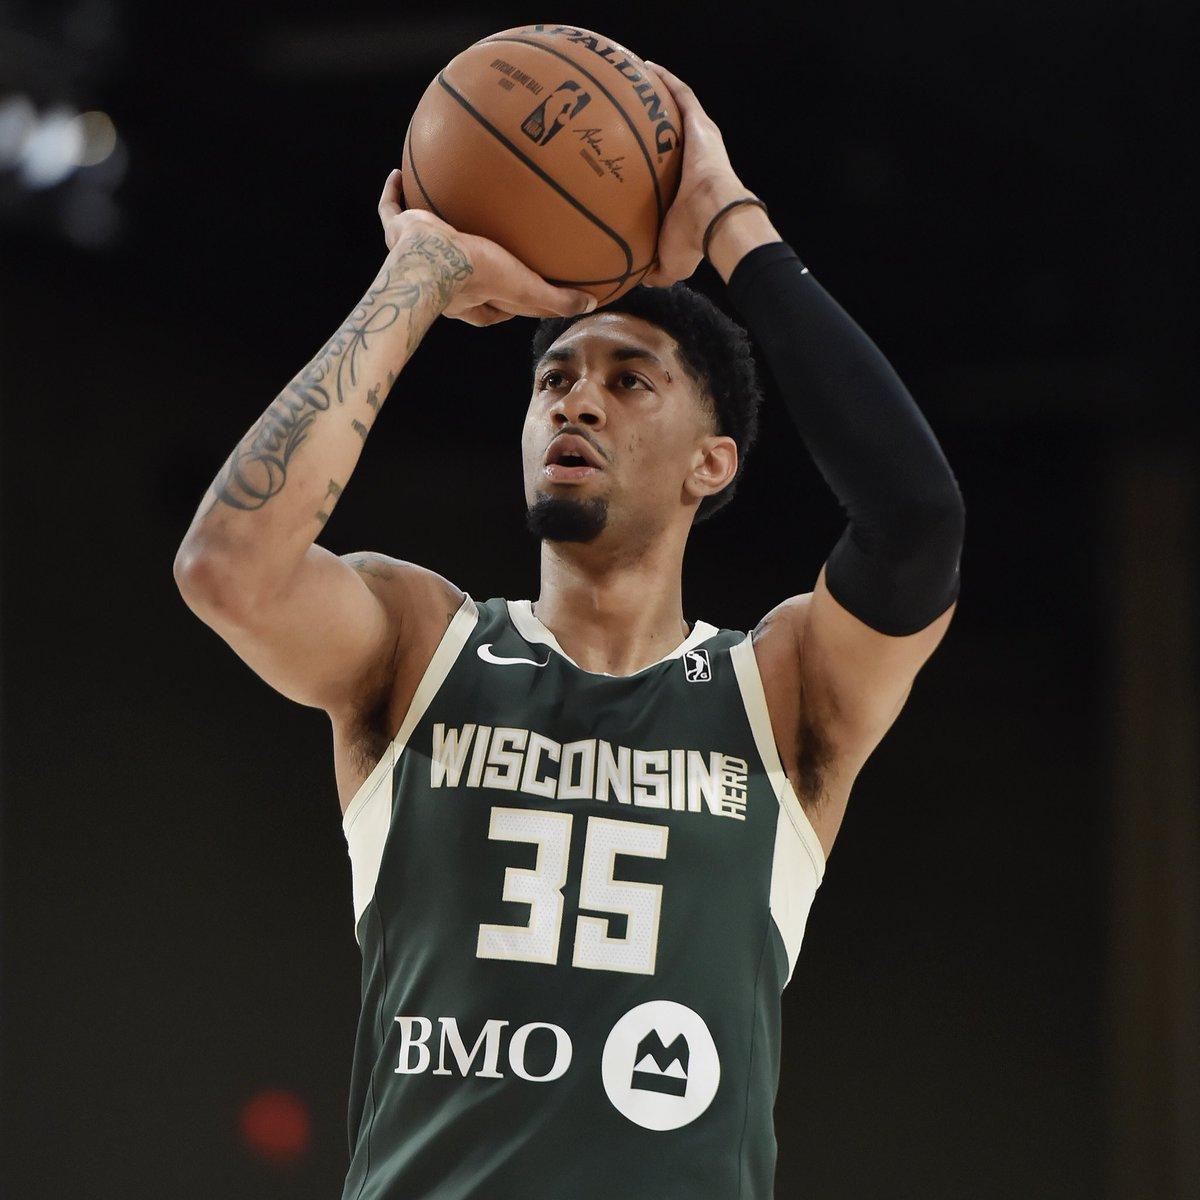 e0d7f8e3dba Milwaukee Bucks on Twitter